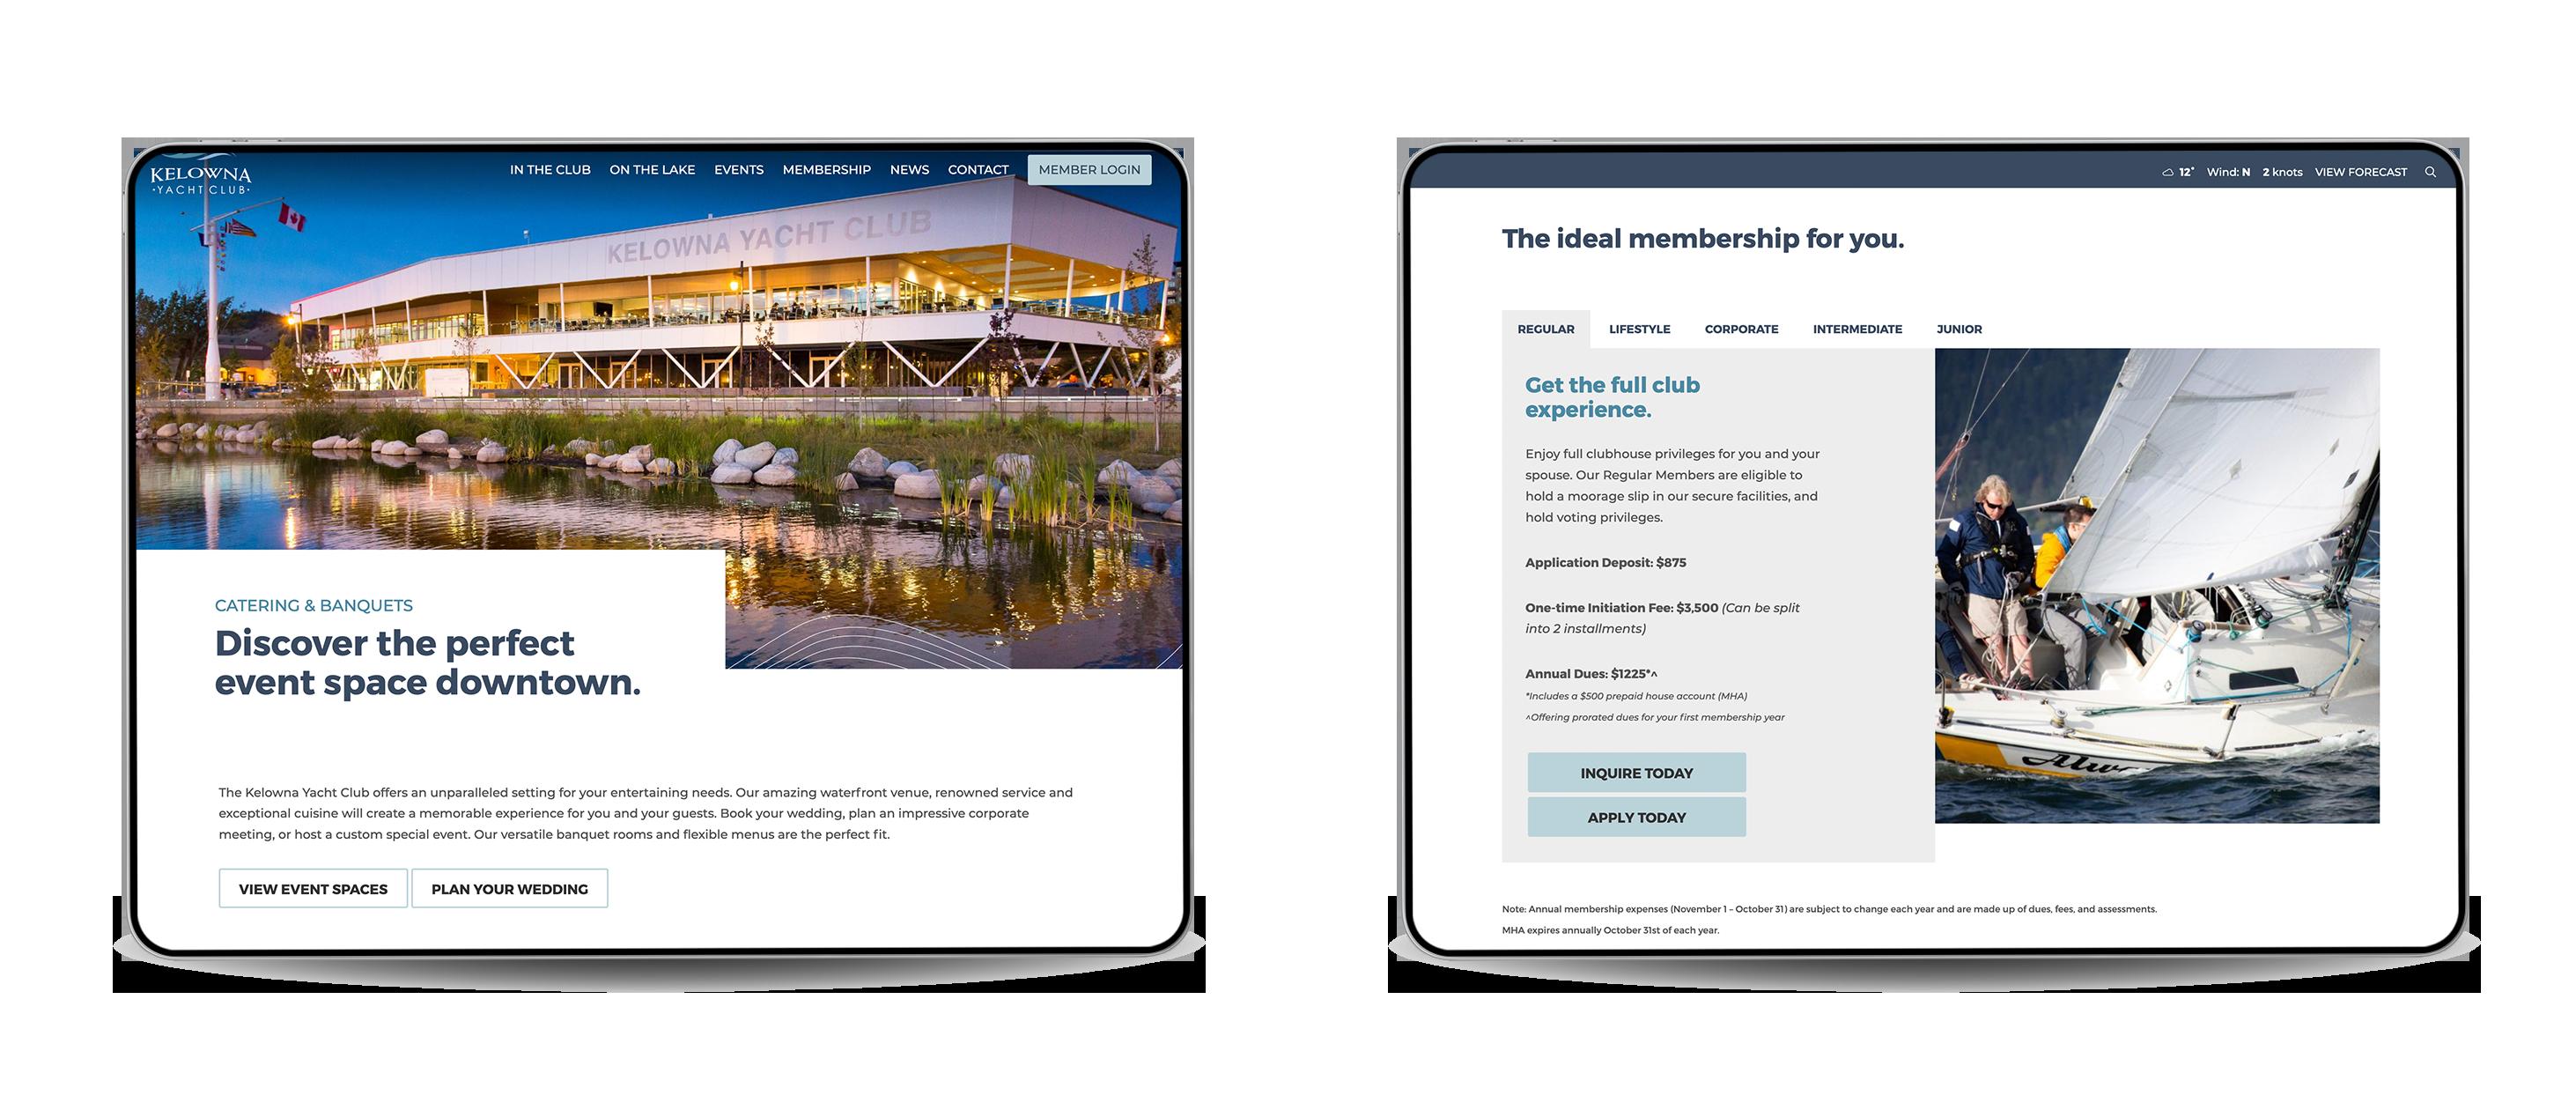 Kelowna Yacht Club Website Mockups on iPads